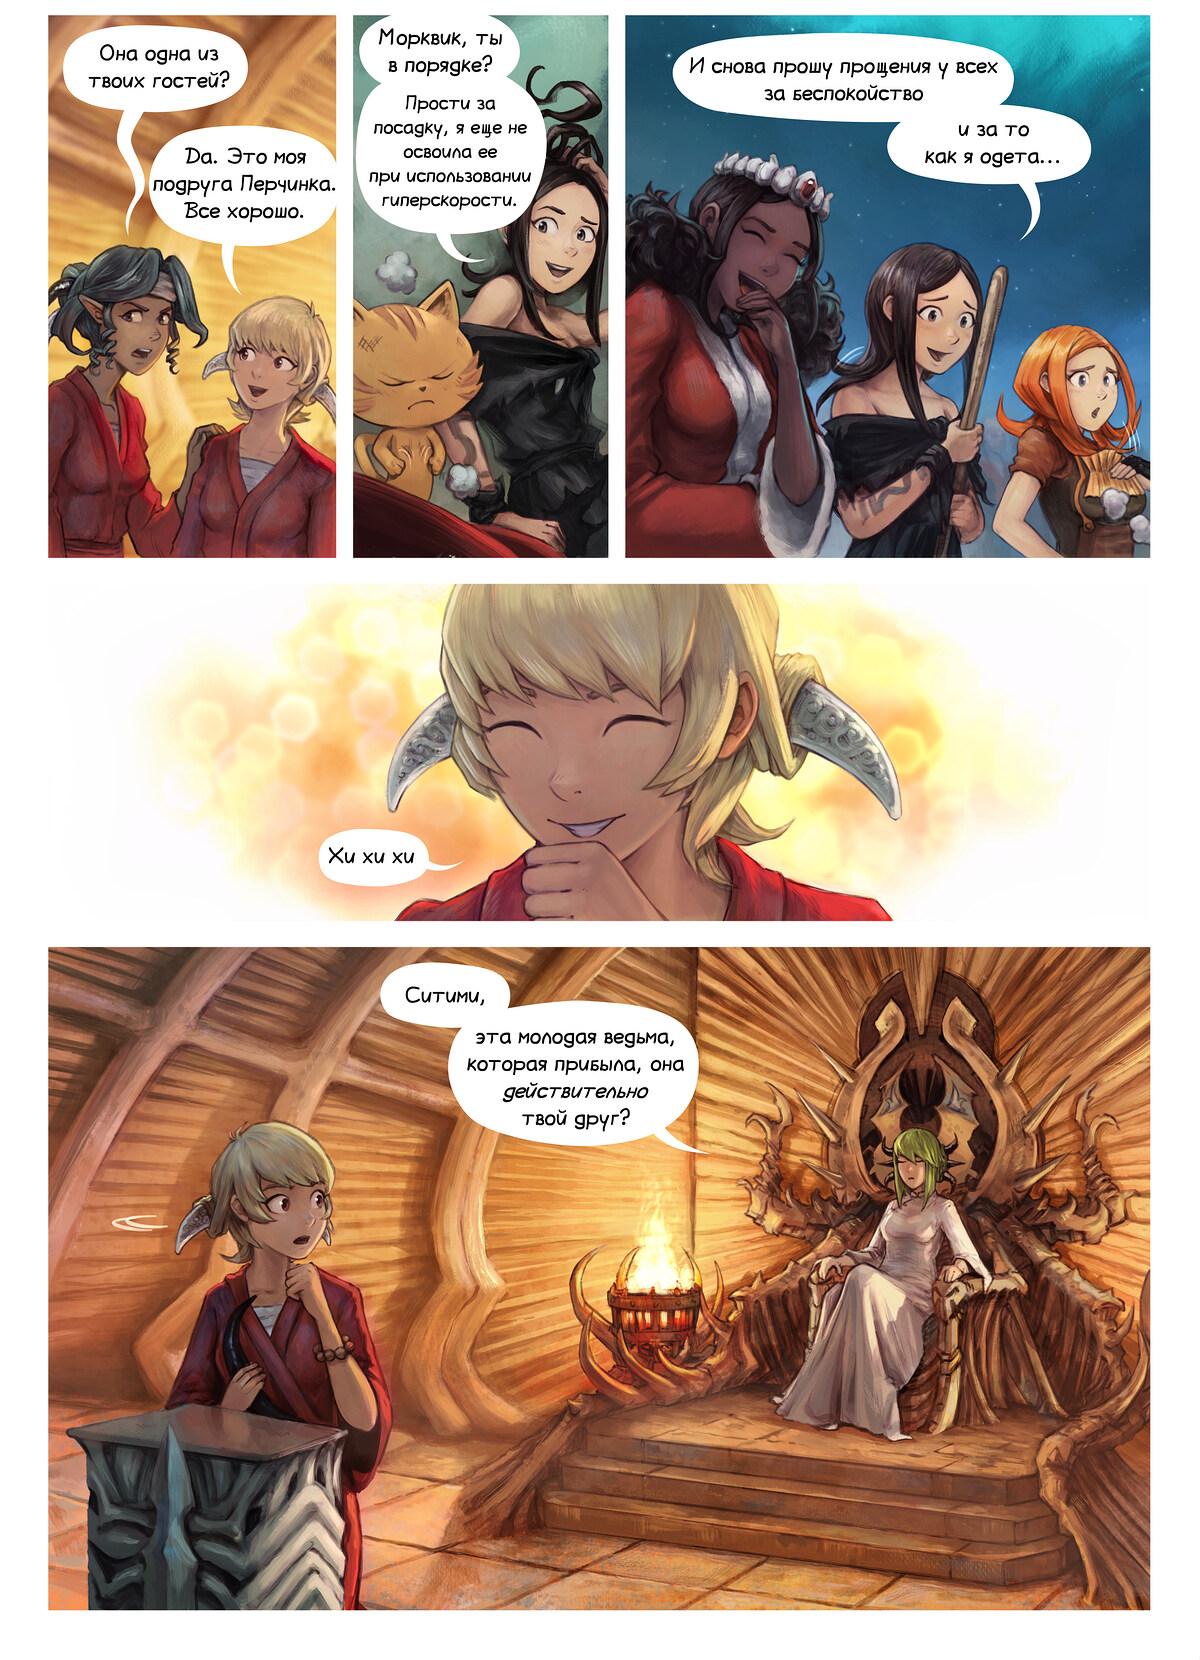 Эпизод 34: Посвящение Ситими, Page 3